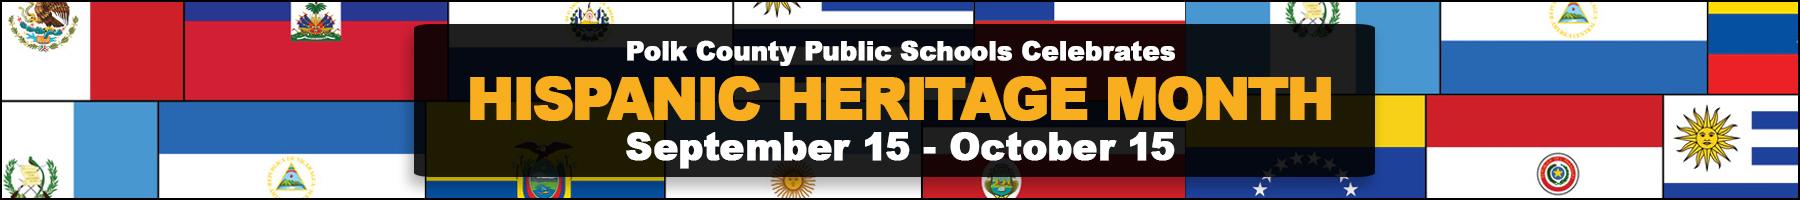 Polk County Public Schools celebrates Hispanic Heritage Month September 15 - October 15